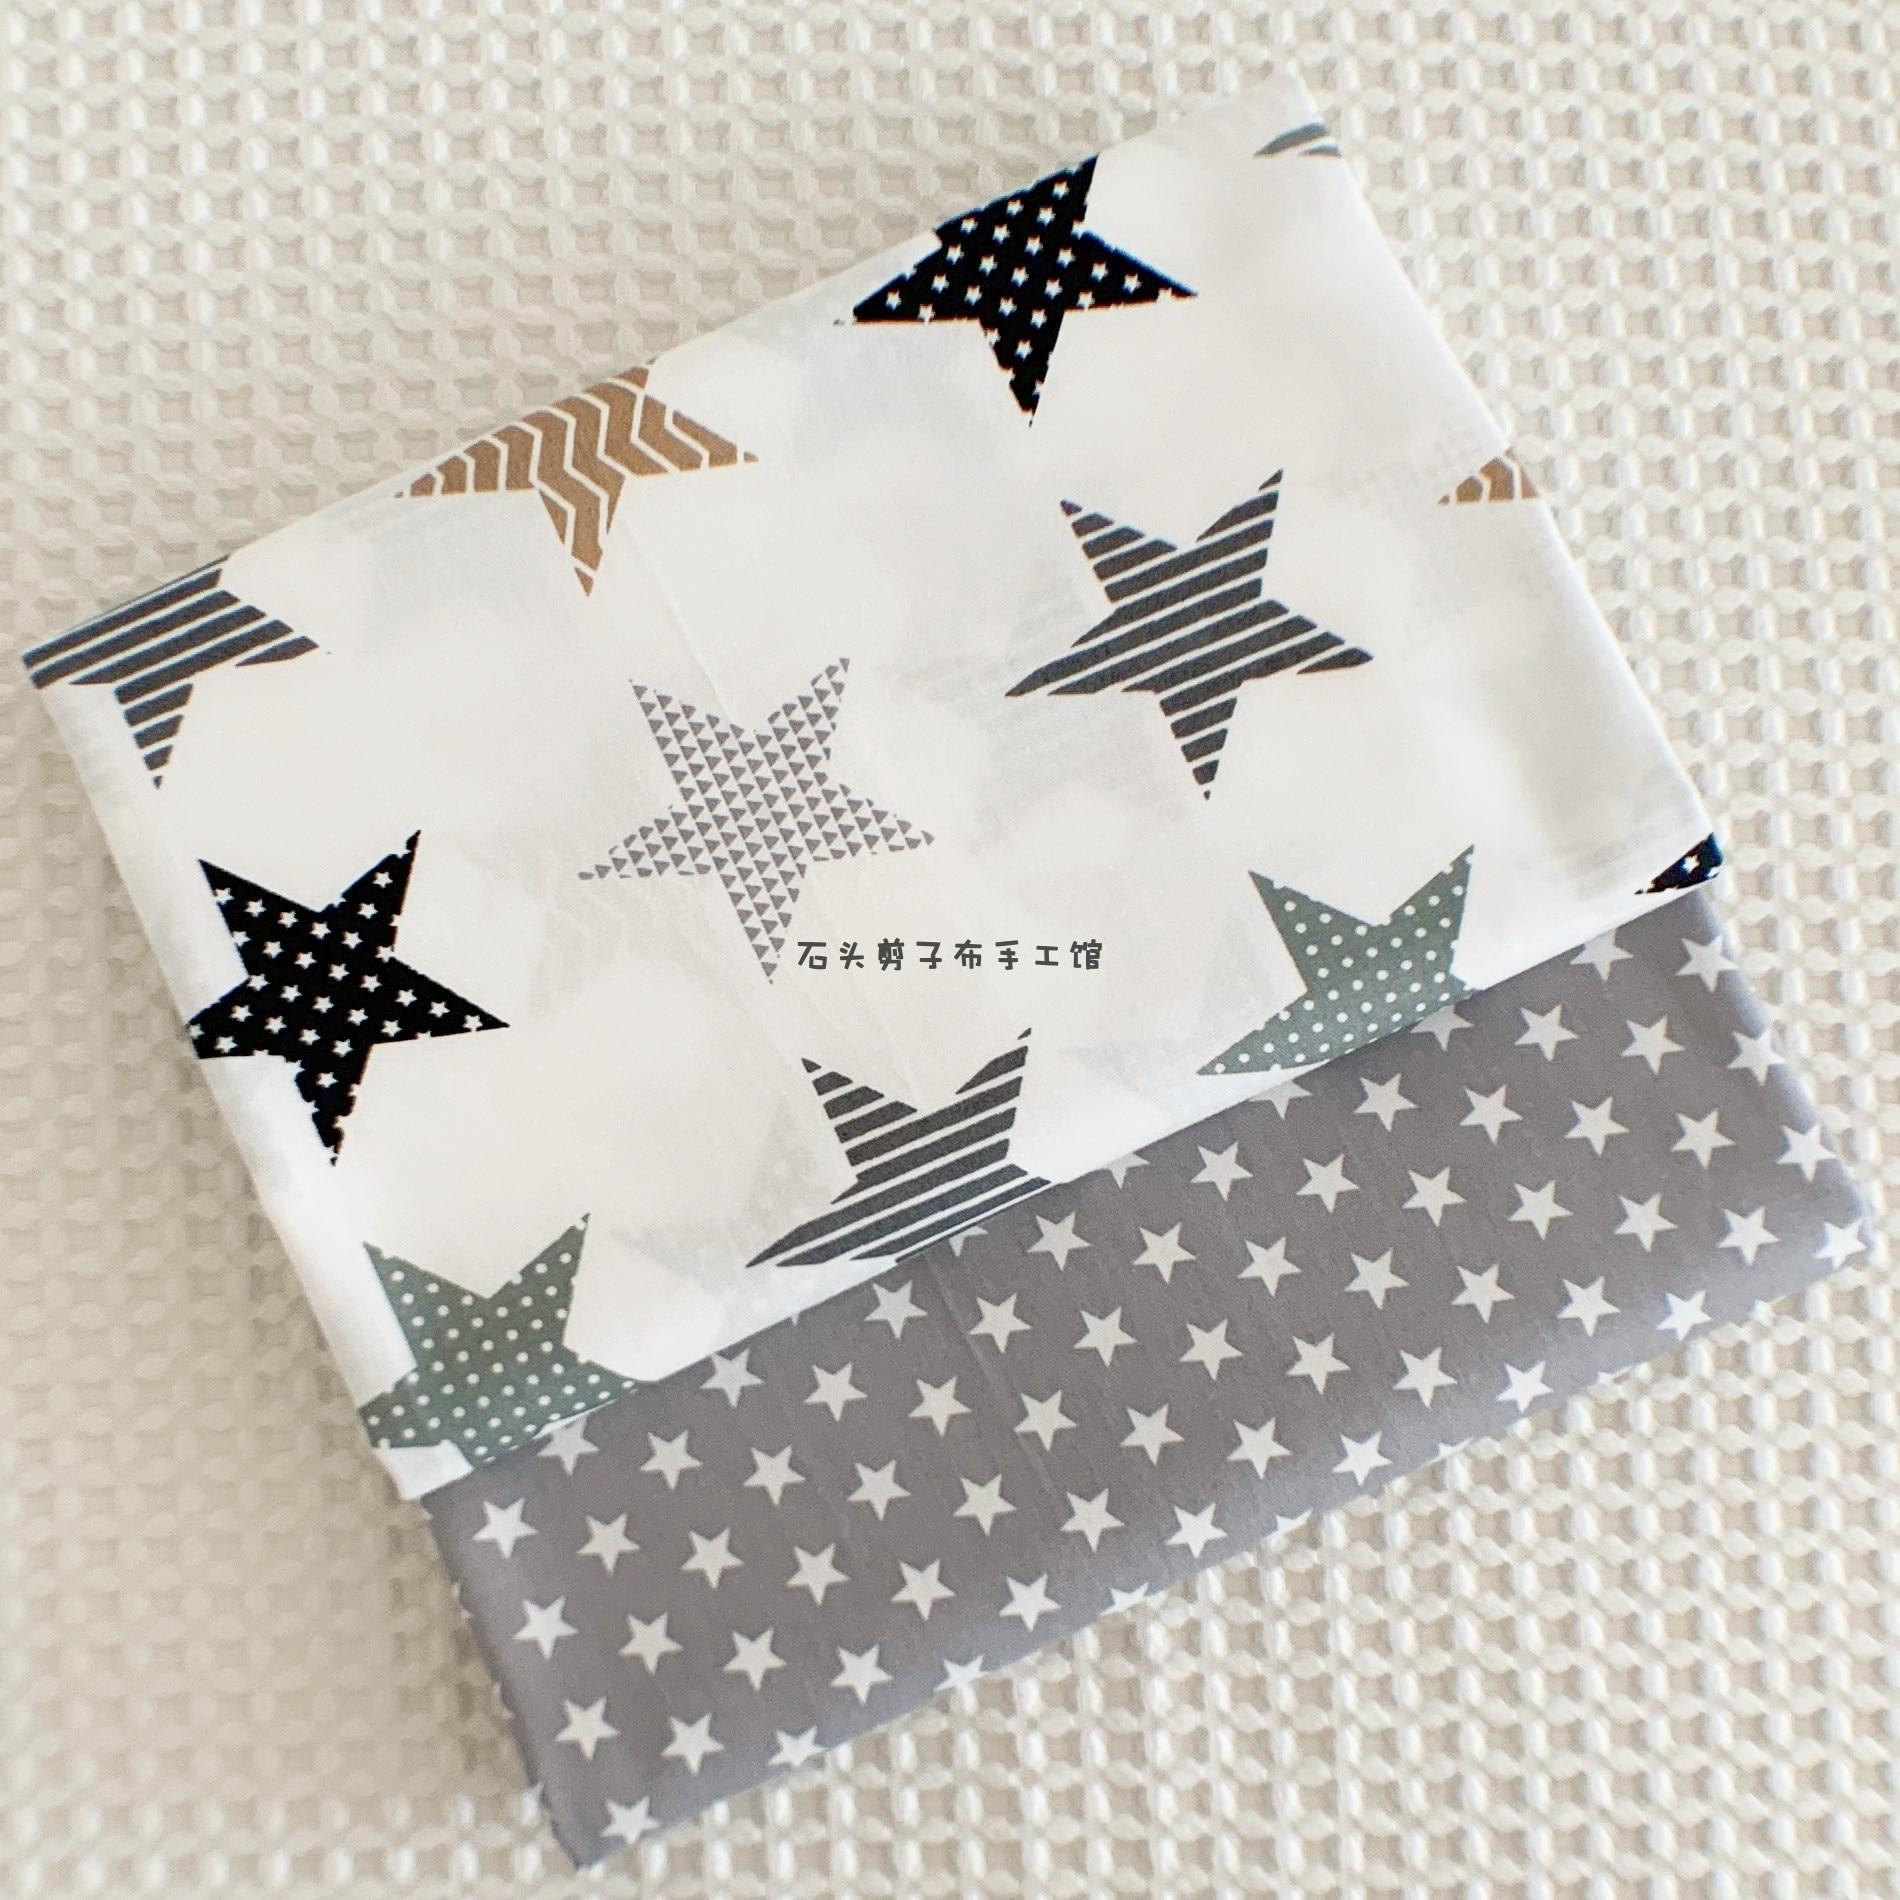 BIY Fabric envio gratis patches iron on patches patch Clothing tapirulan elettrico 50*150cm DIY Cloth cotton fabric